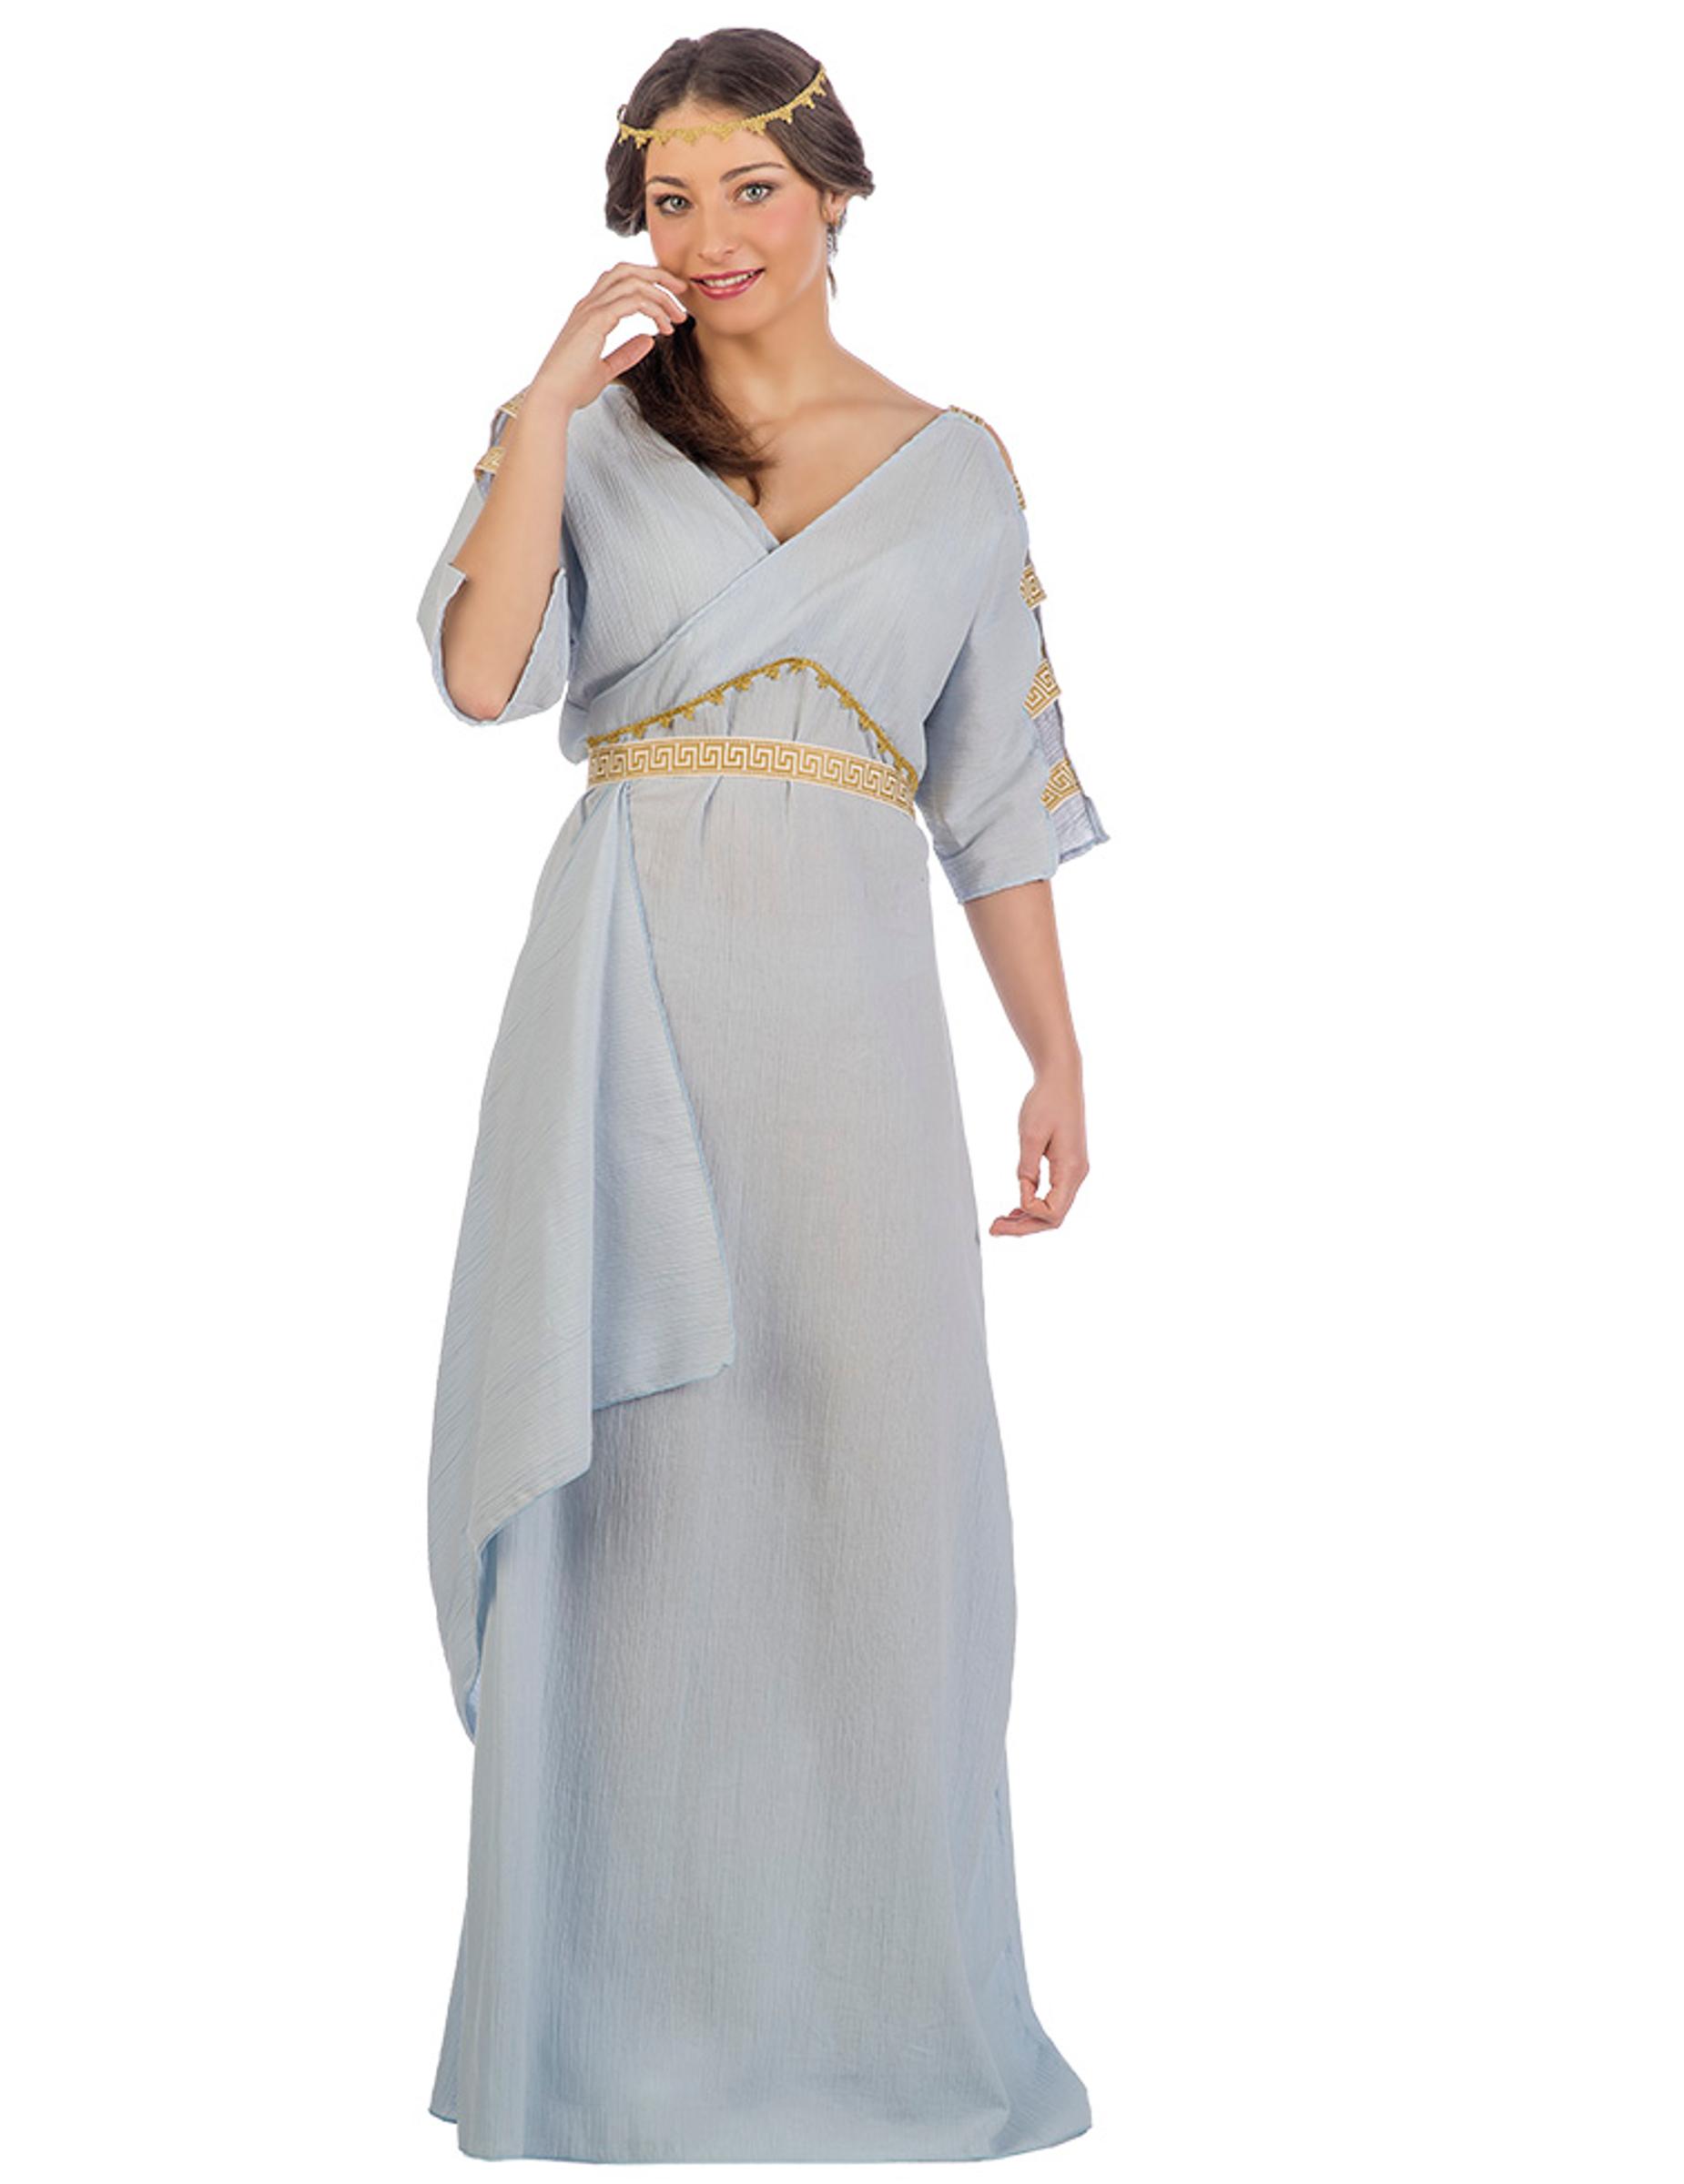 Principessa Romana Of Costume Da Principessa Romana Donna Costumi Adulti E